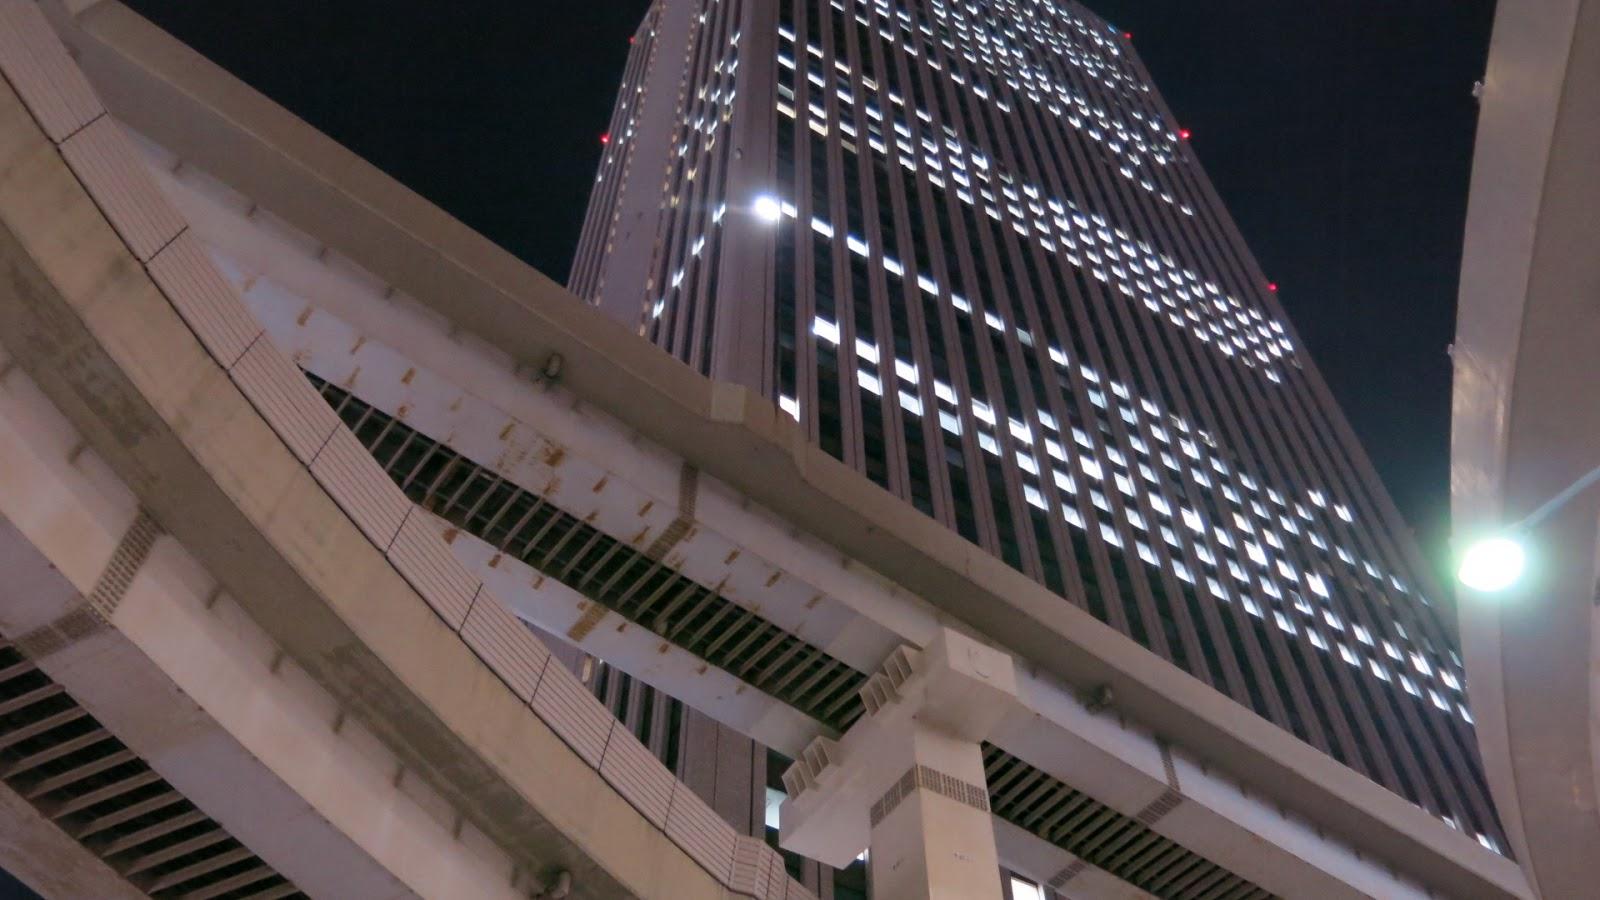 Photo of 【東京都市傳說】池袋太陽城其實是巨大的鎮魂碑?夜訪東池袋中央公園